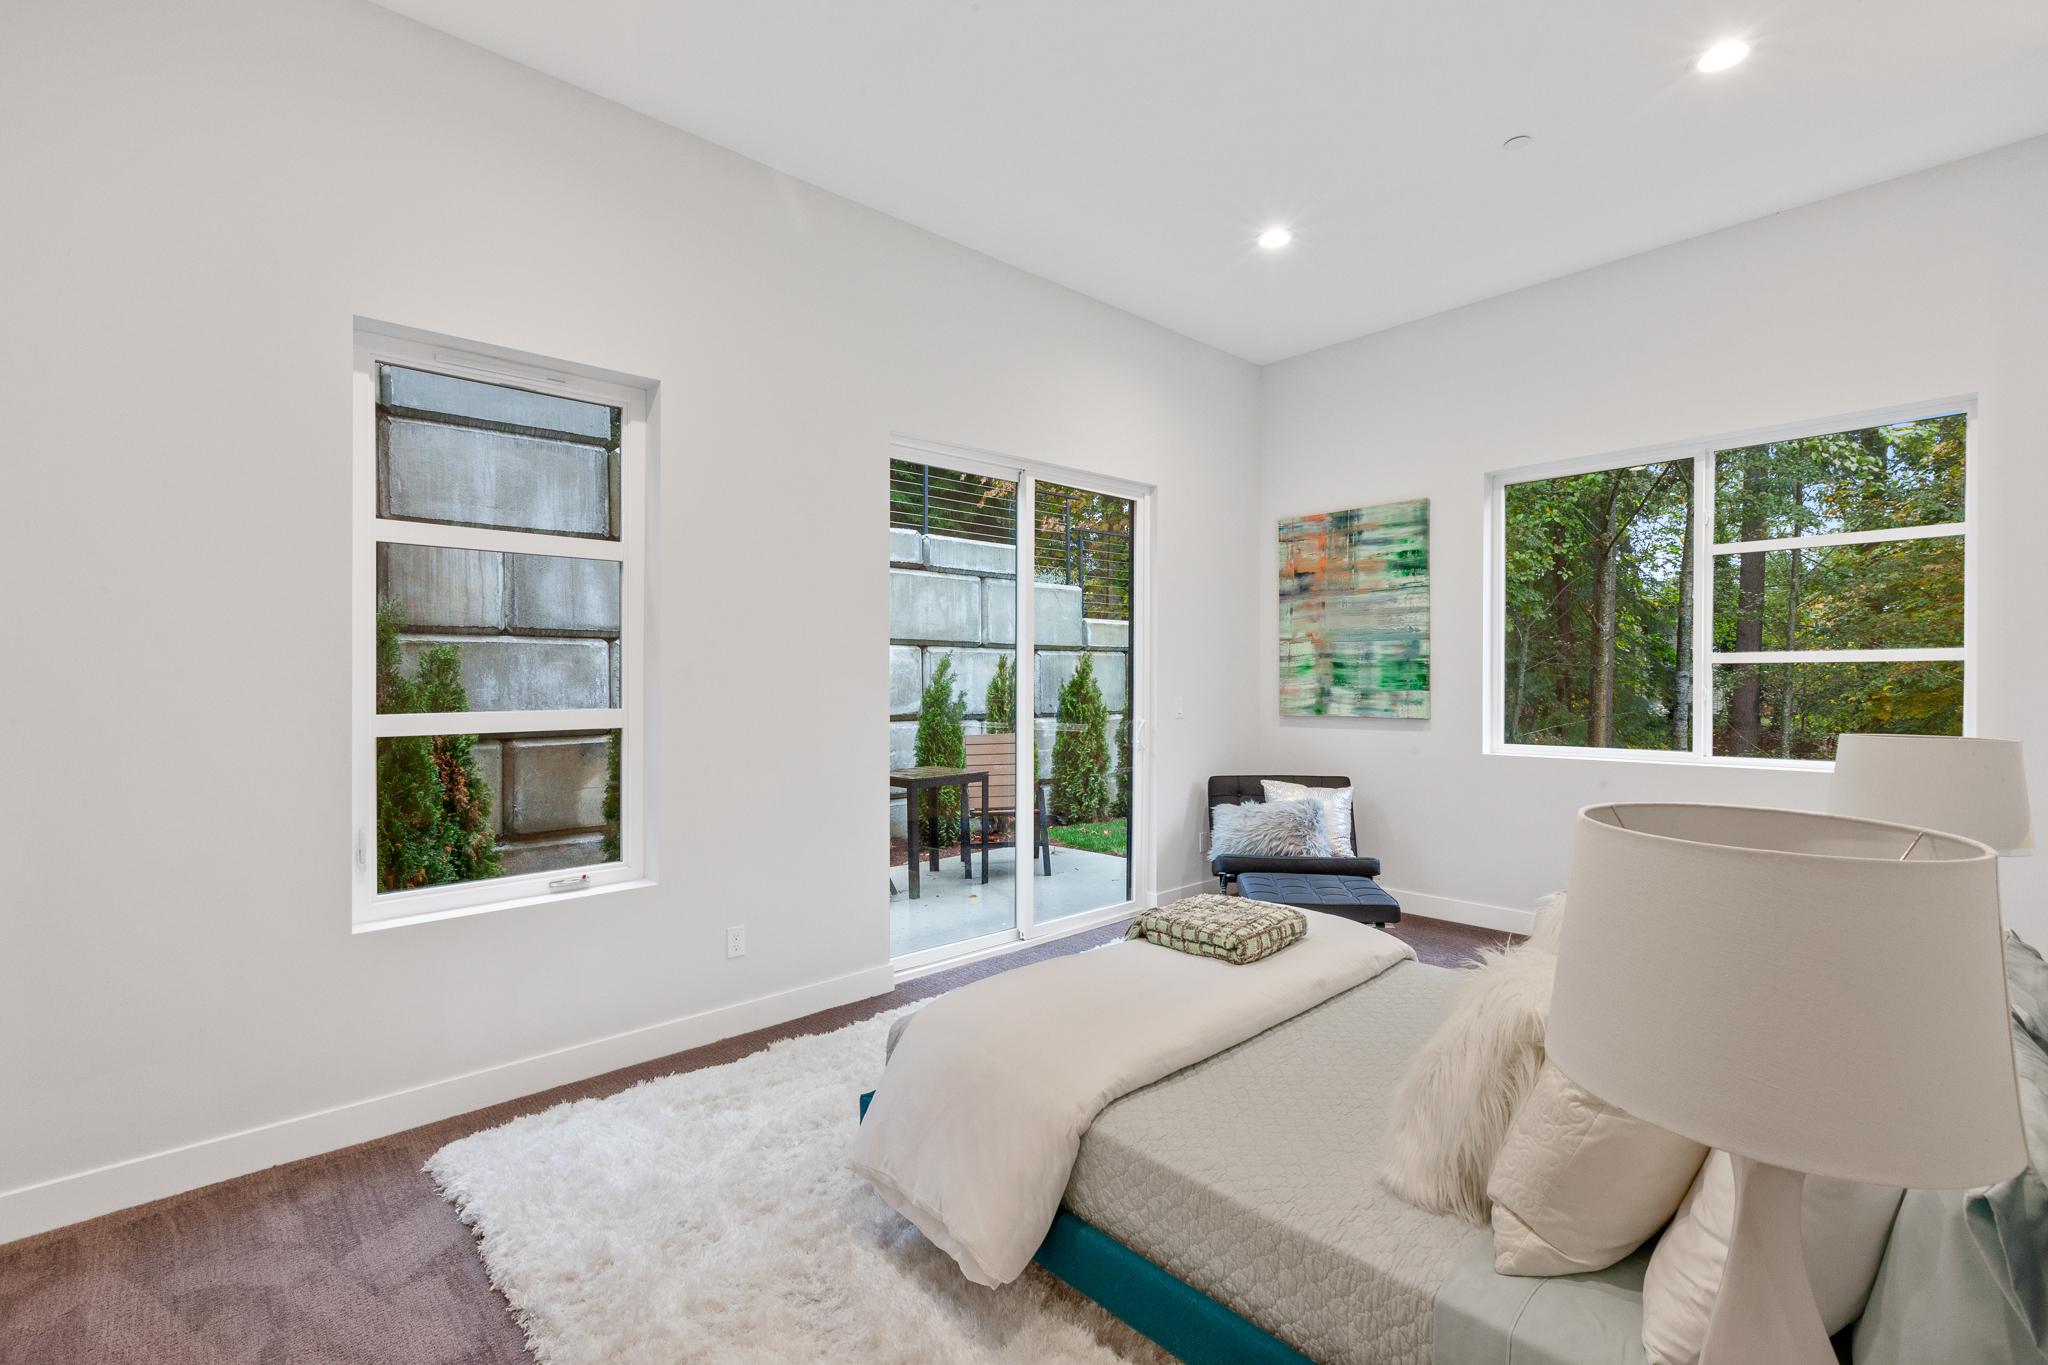 Bedroom - Luxury Real Estate - 18109 84th Ave W, Edmonds